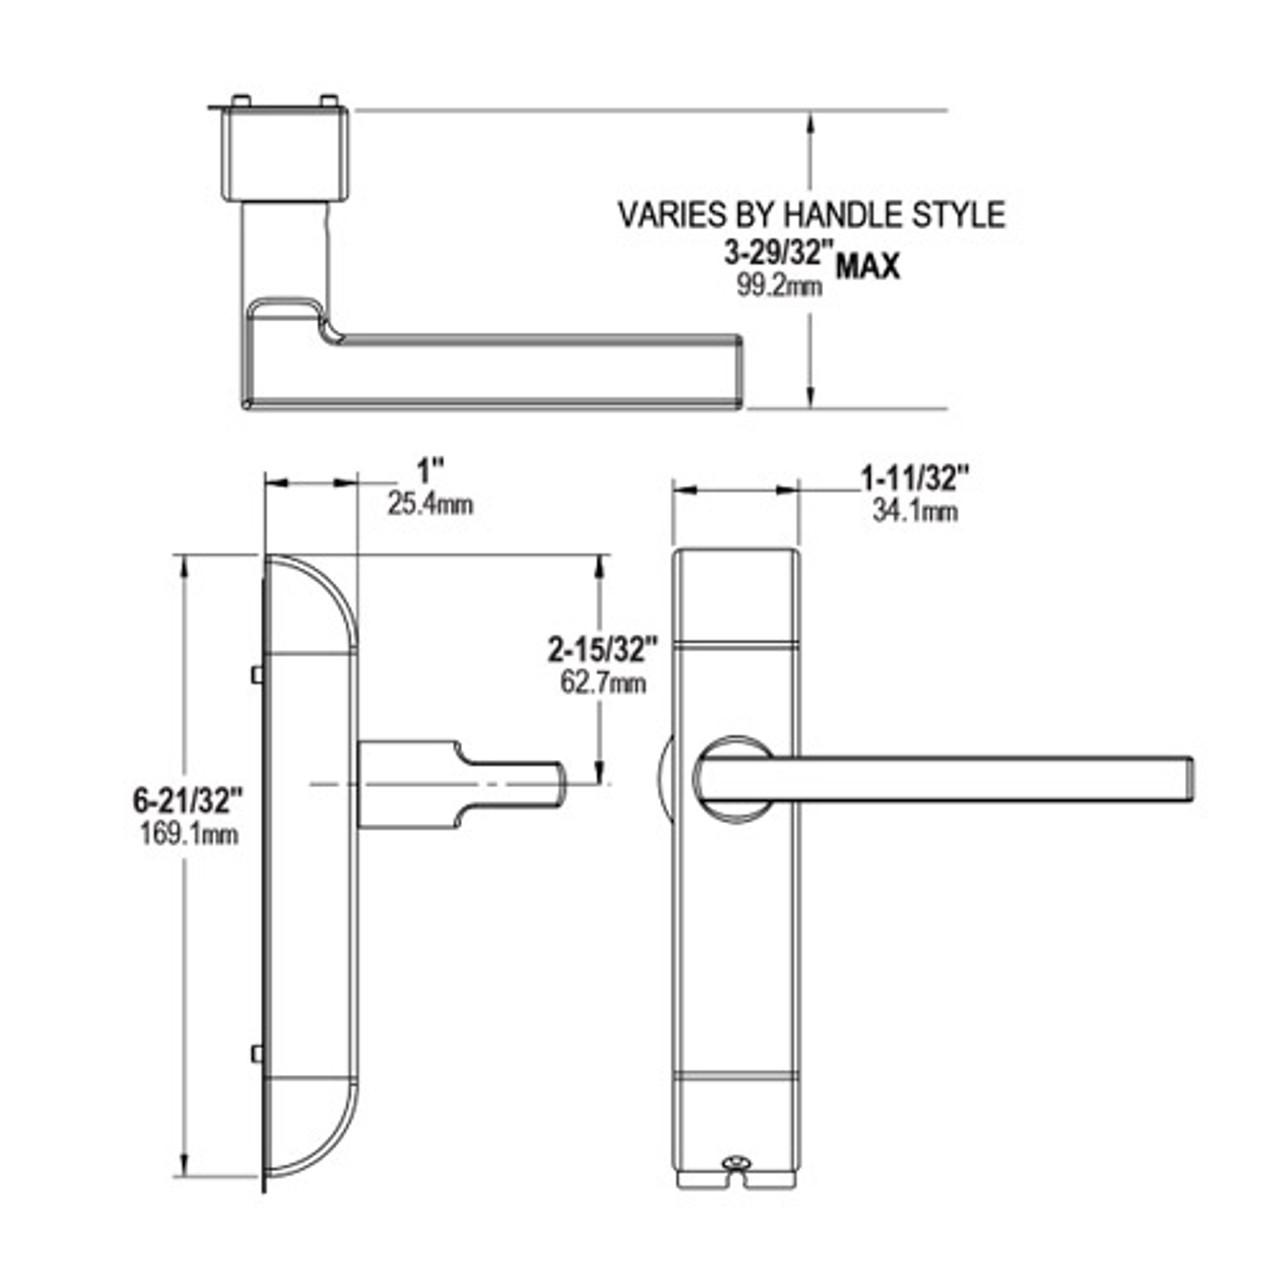 4600M-MI-611-US3 Adams Rite MI Designer handle Dimensional View